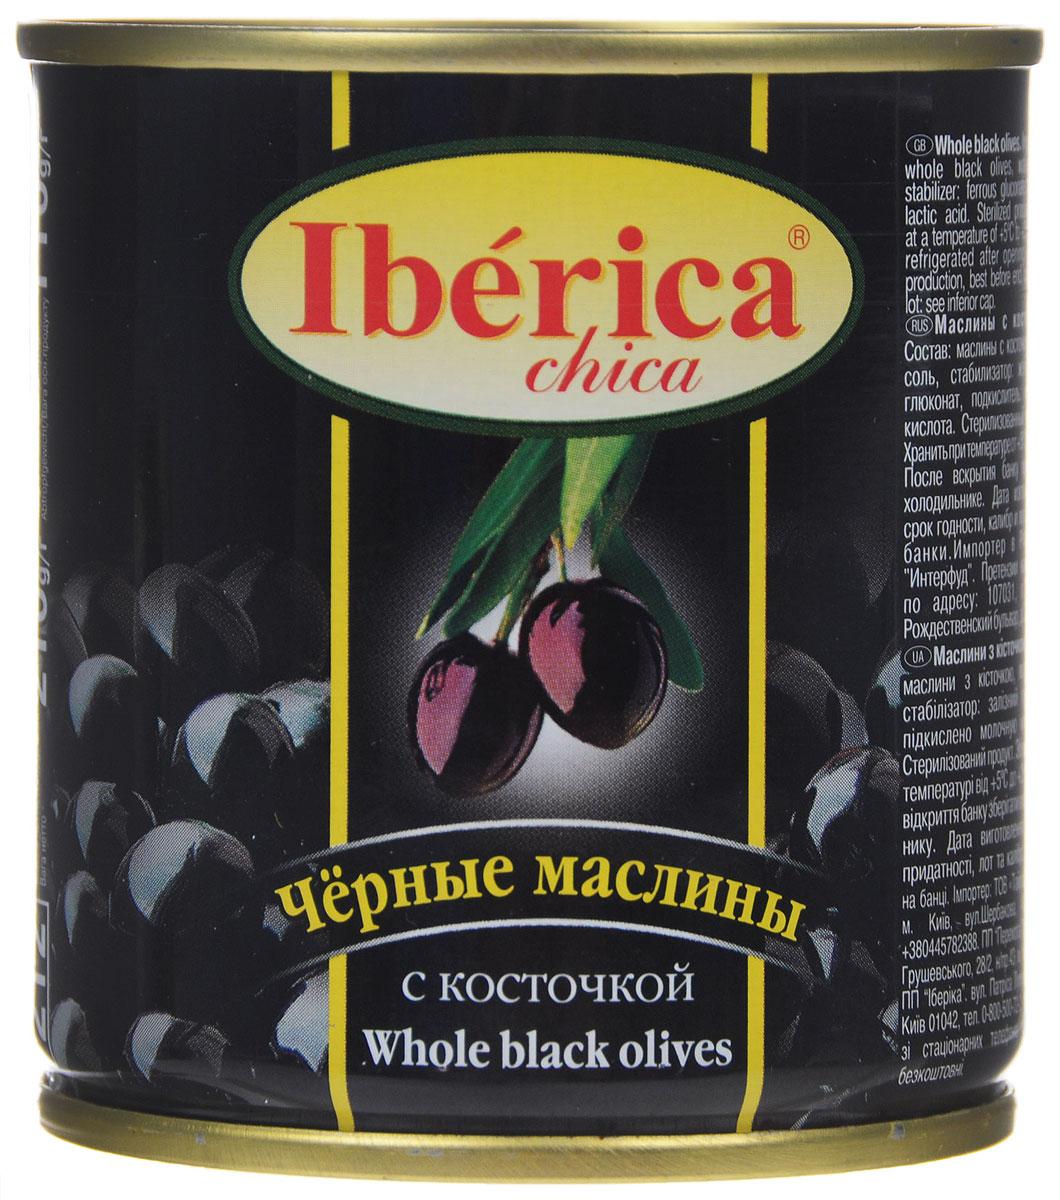 Iberica Сhica маслины с косточкой, 210 г каперсы iberica бутоны